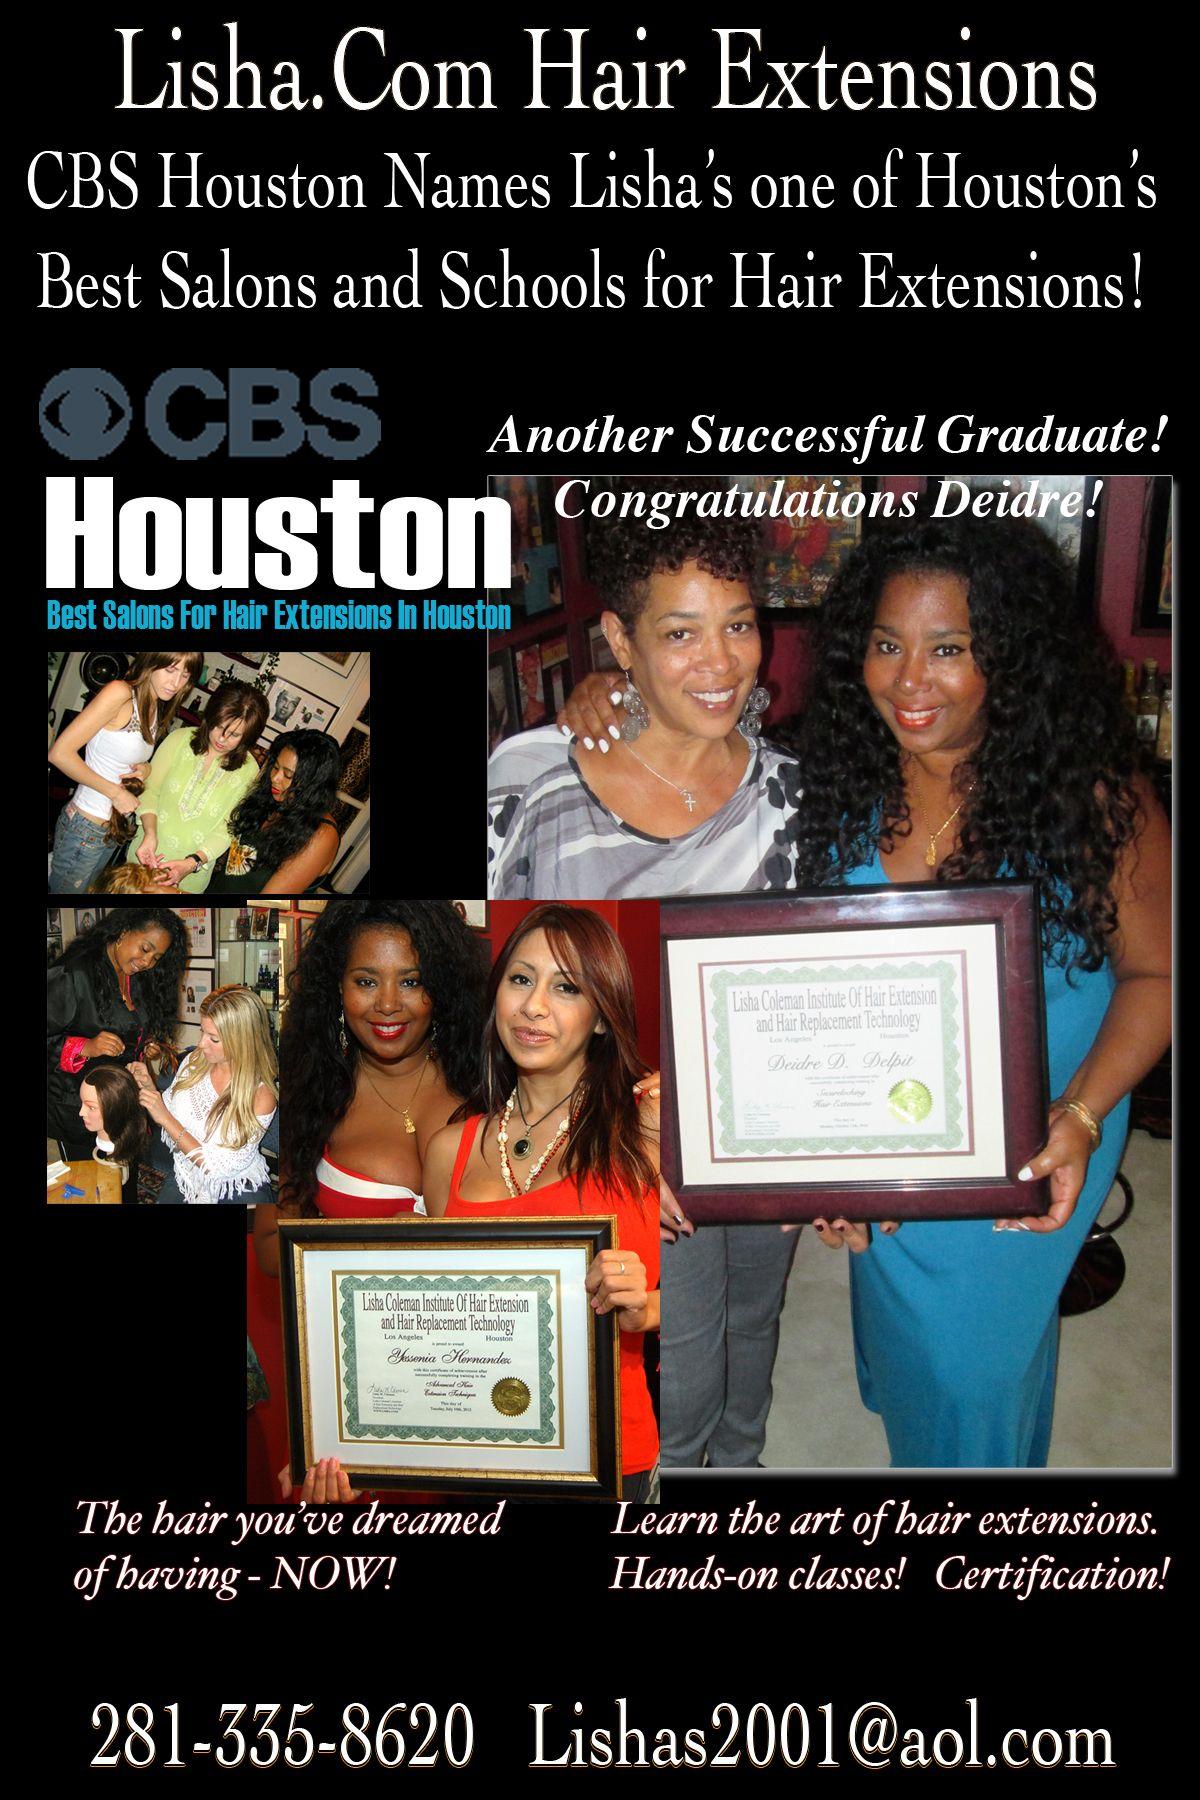 Another Lisha Coleman graduate! Congratulations Deidre! Learn the ART of HAIR EXTENSIONS! www.Lisha.com 281-825-1600